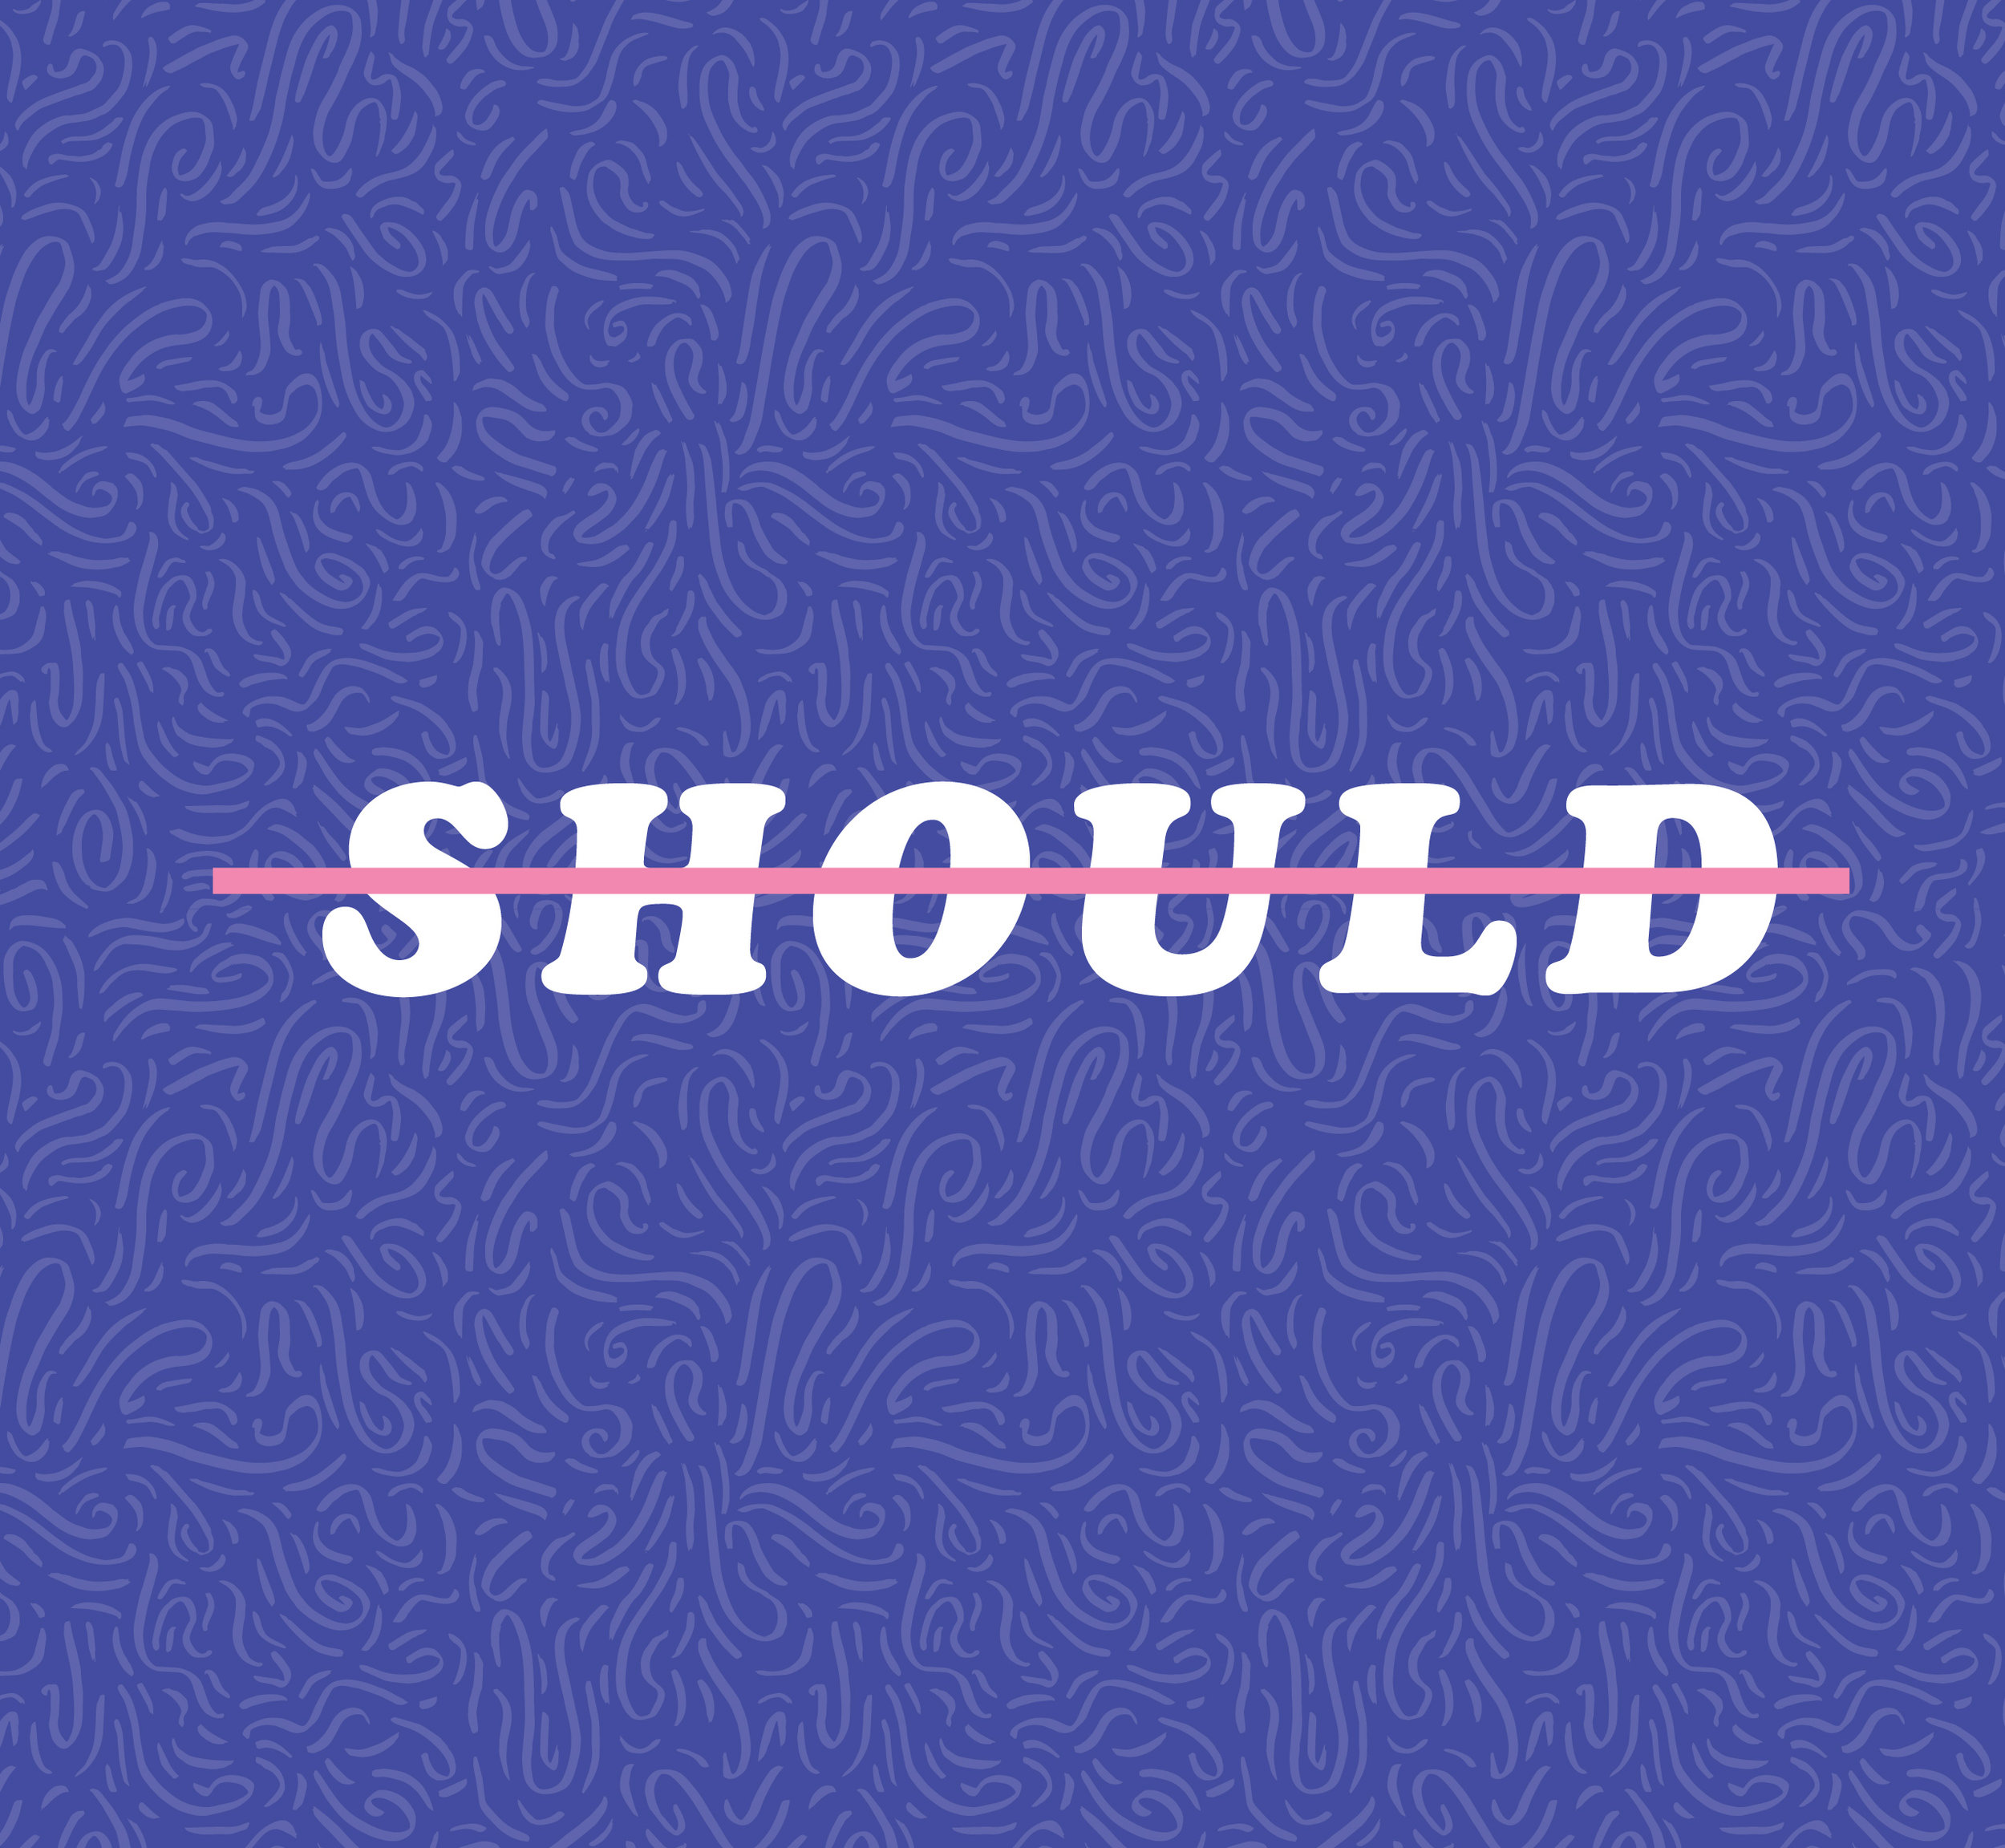 should-03.jpg